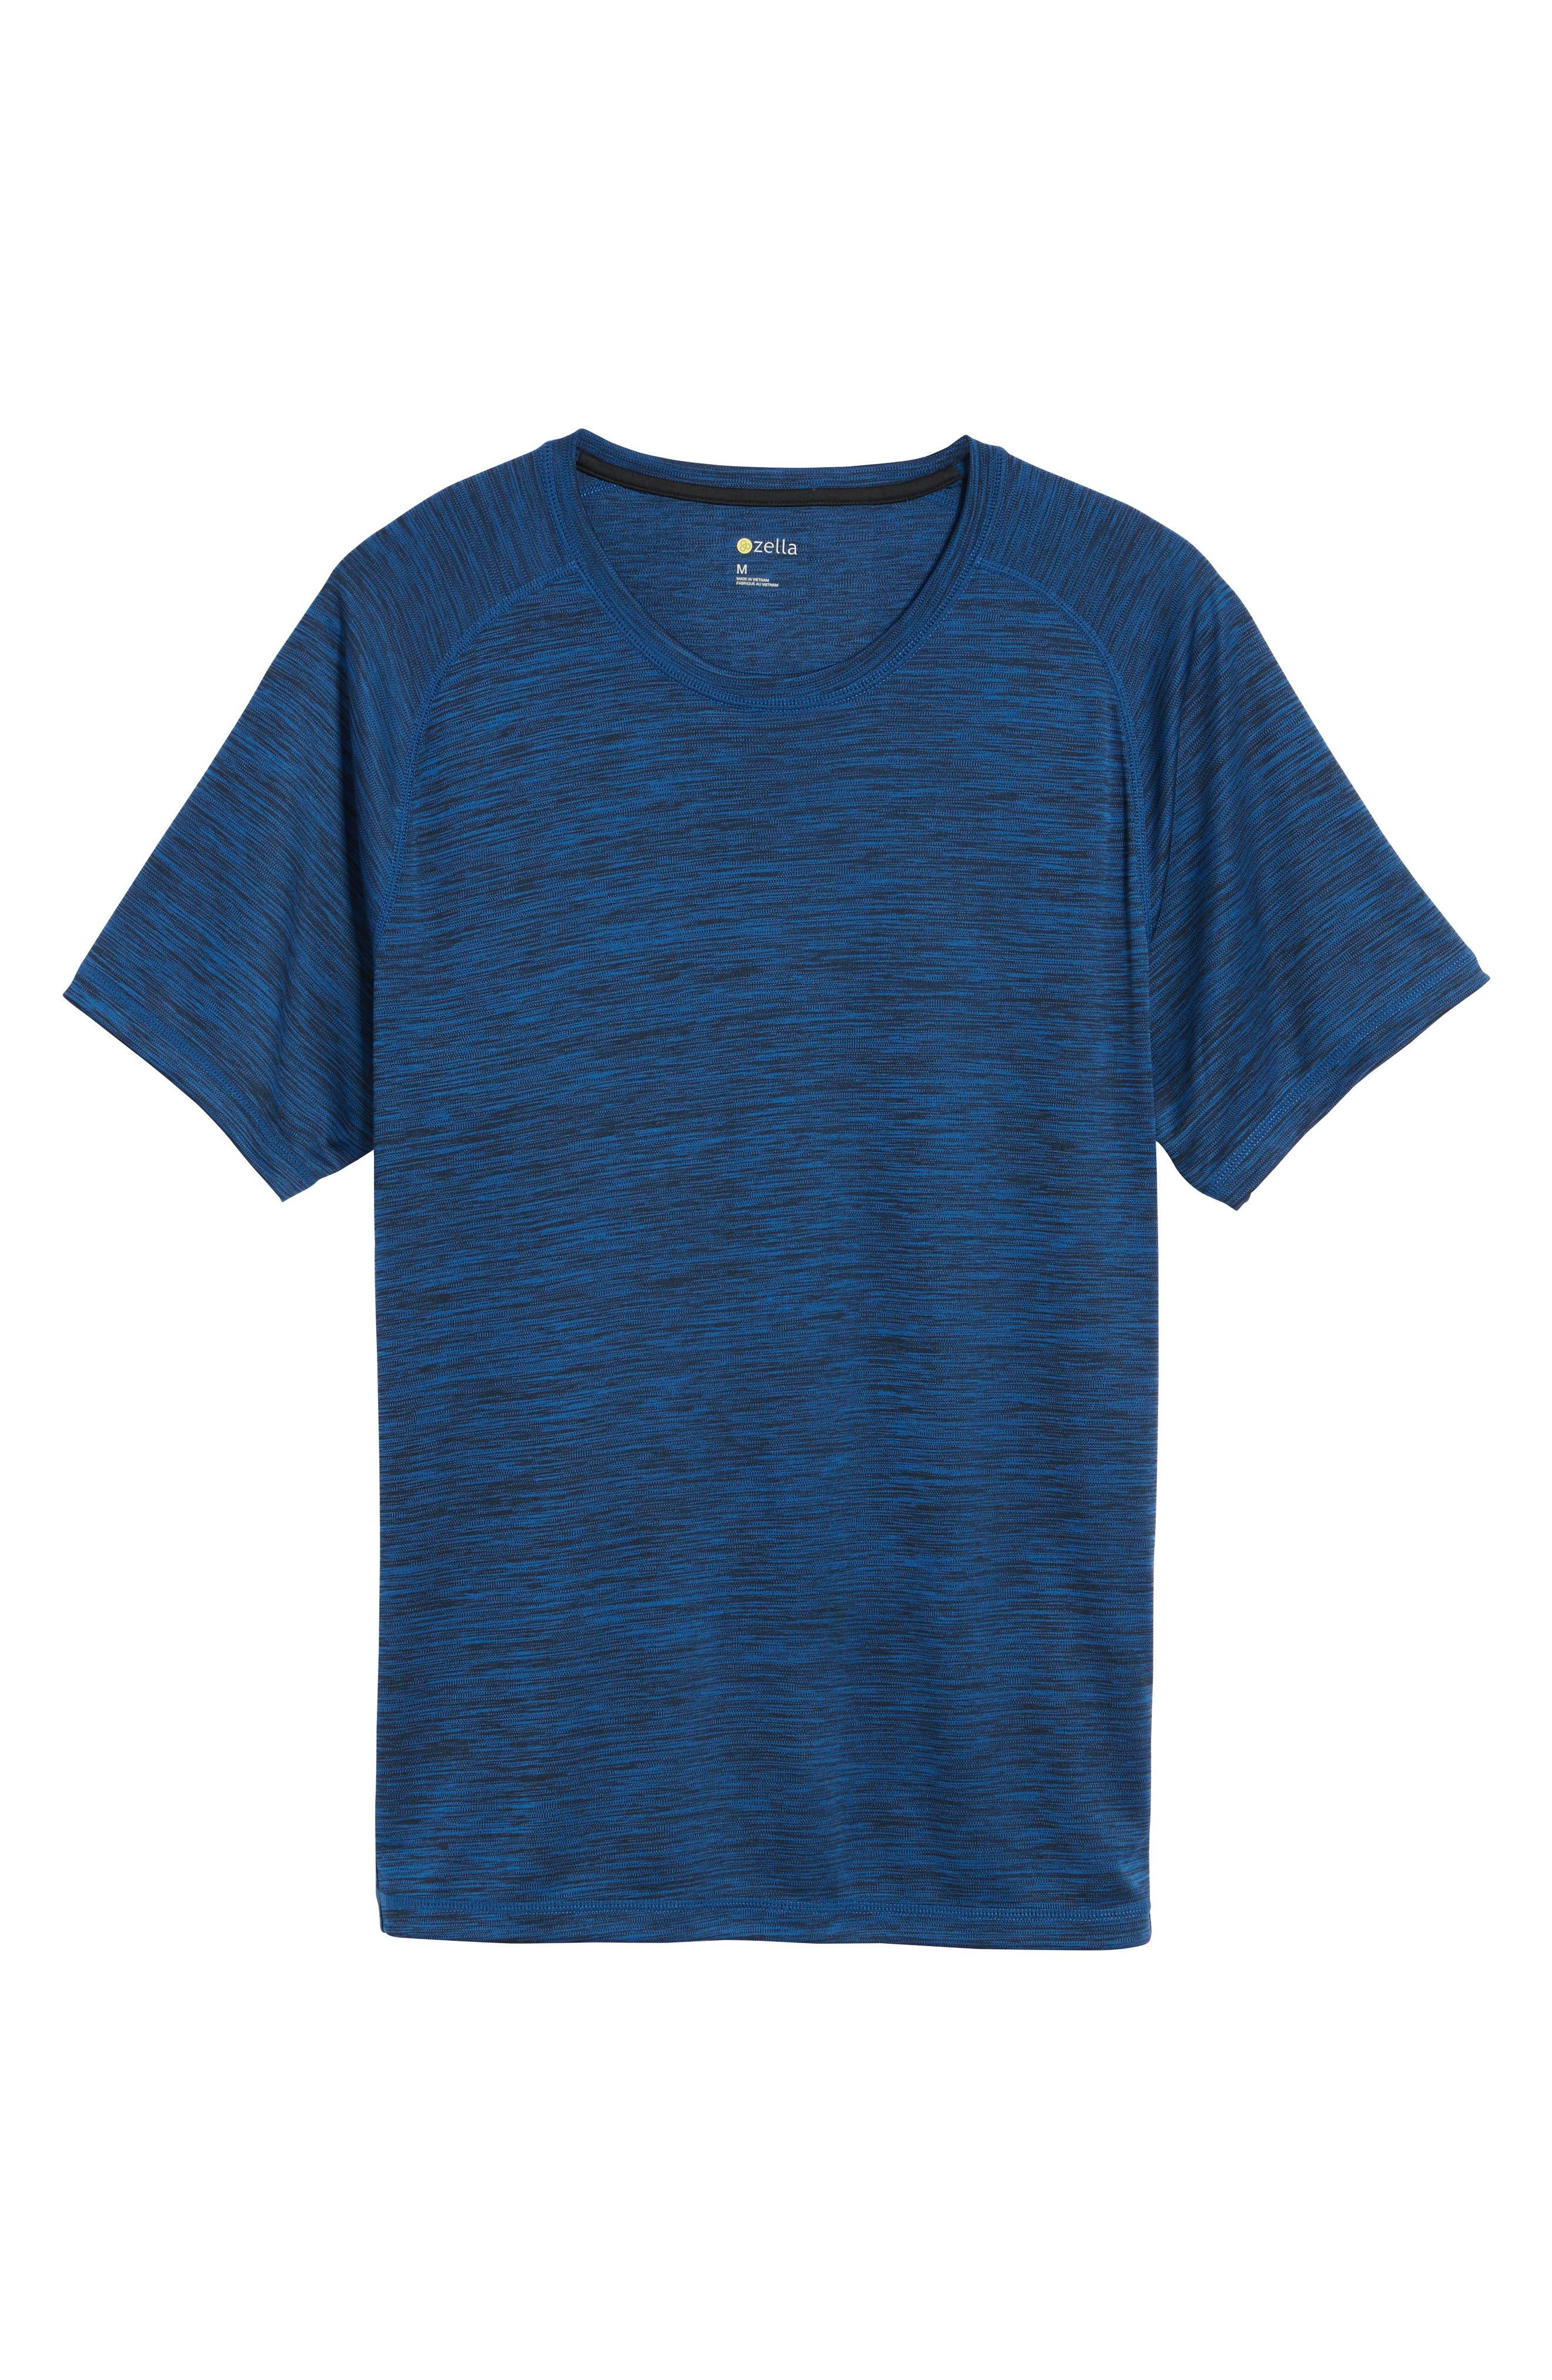 Triplite T-Shirt,                             Alternate thumbnail 75, color,